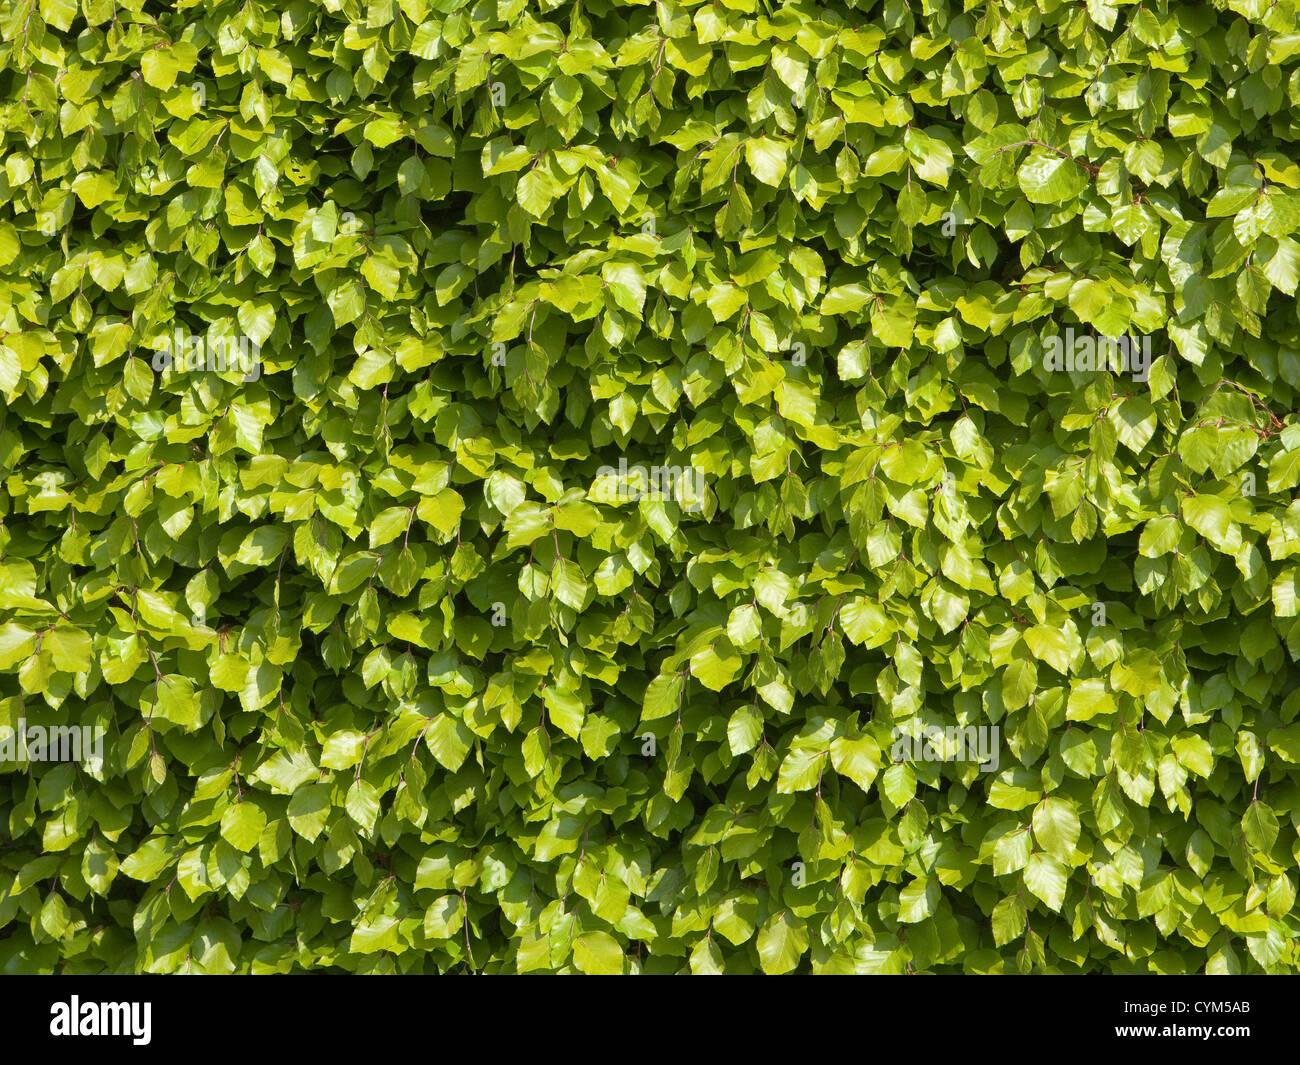 Texture Di Sfondo Di Fresche Foglie Verdi Di Una Siepe Di Faggio In